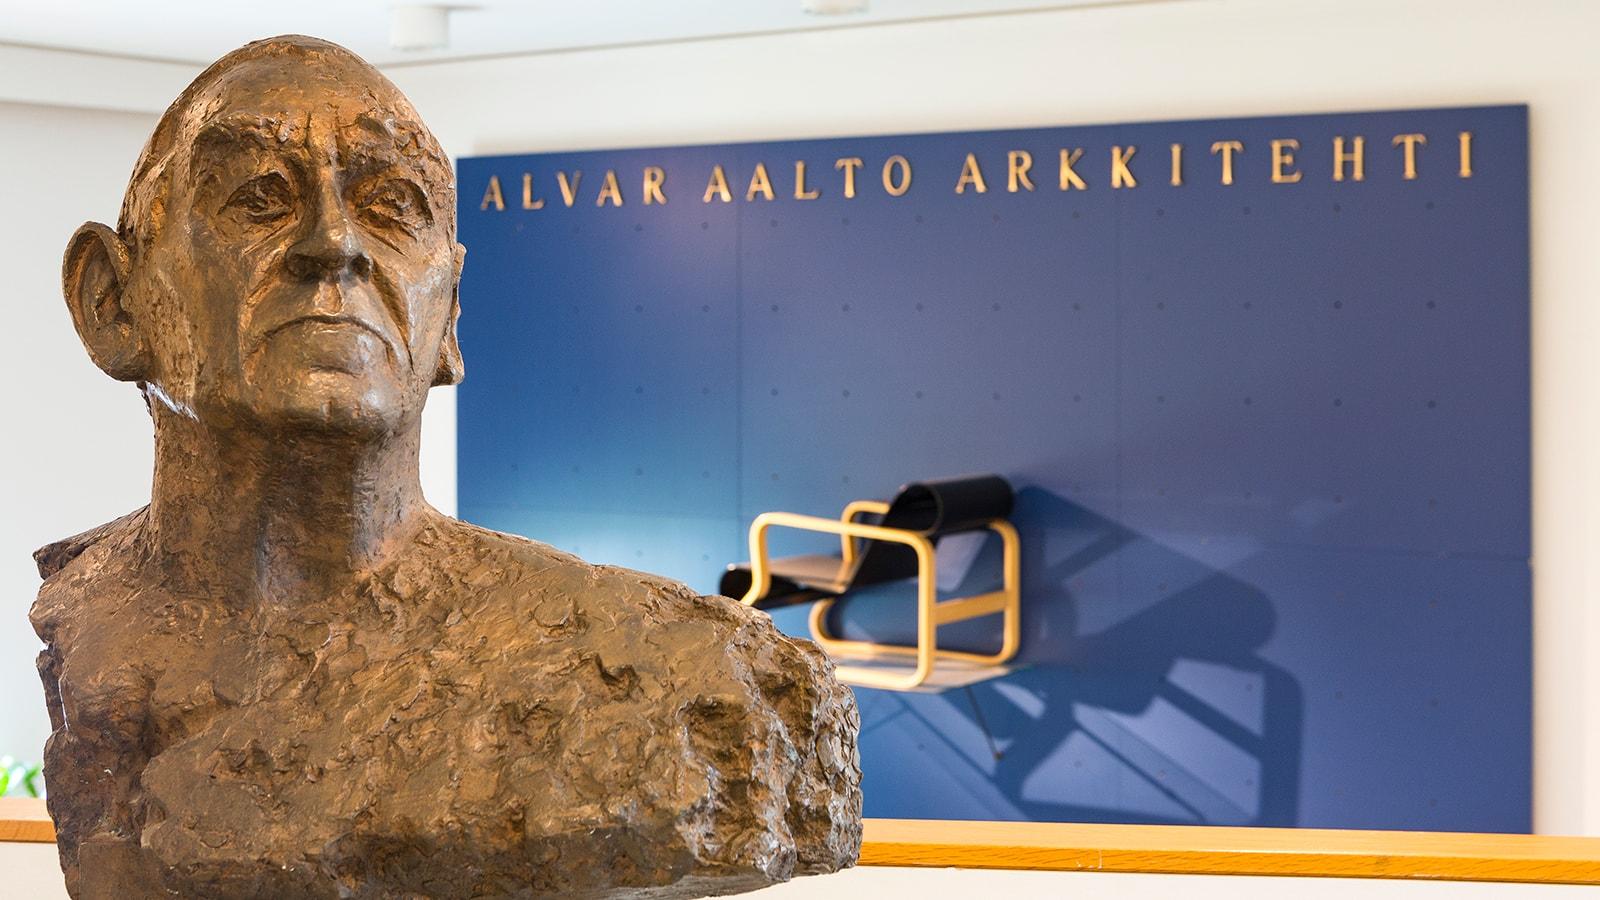 Alvar Aalto statue inside Alvar Aalto Museum